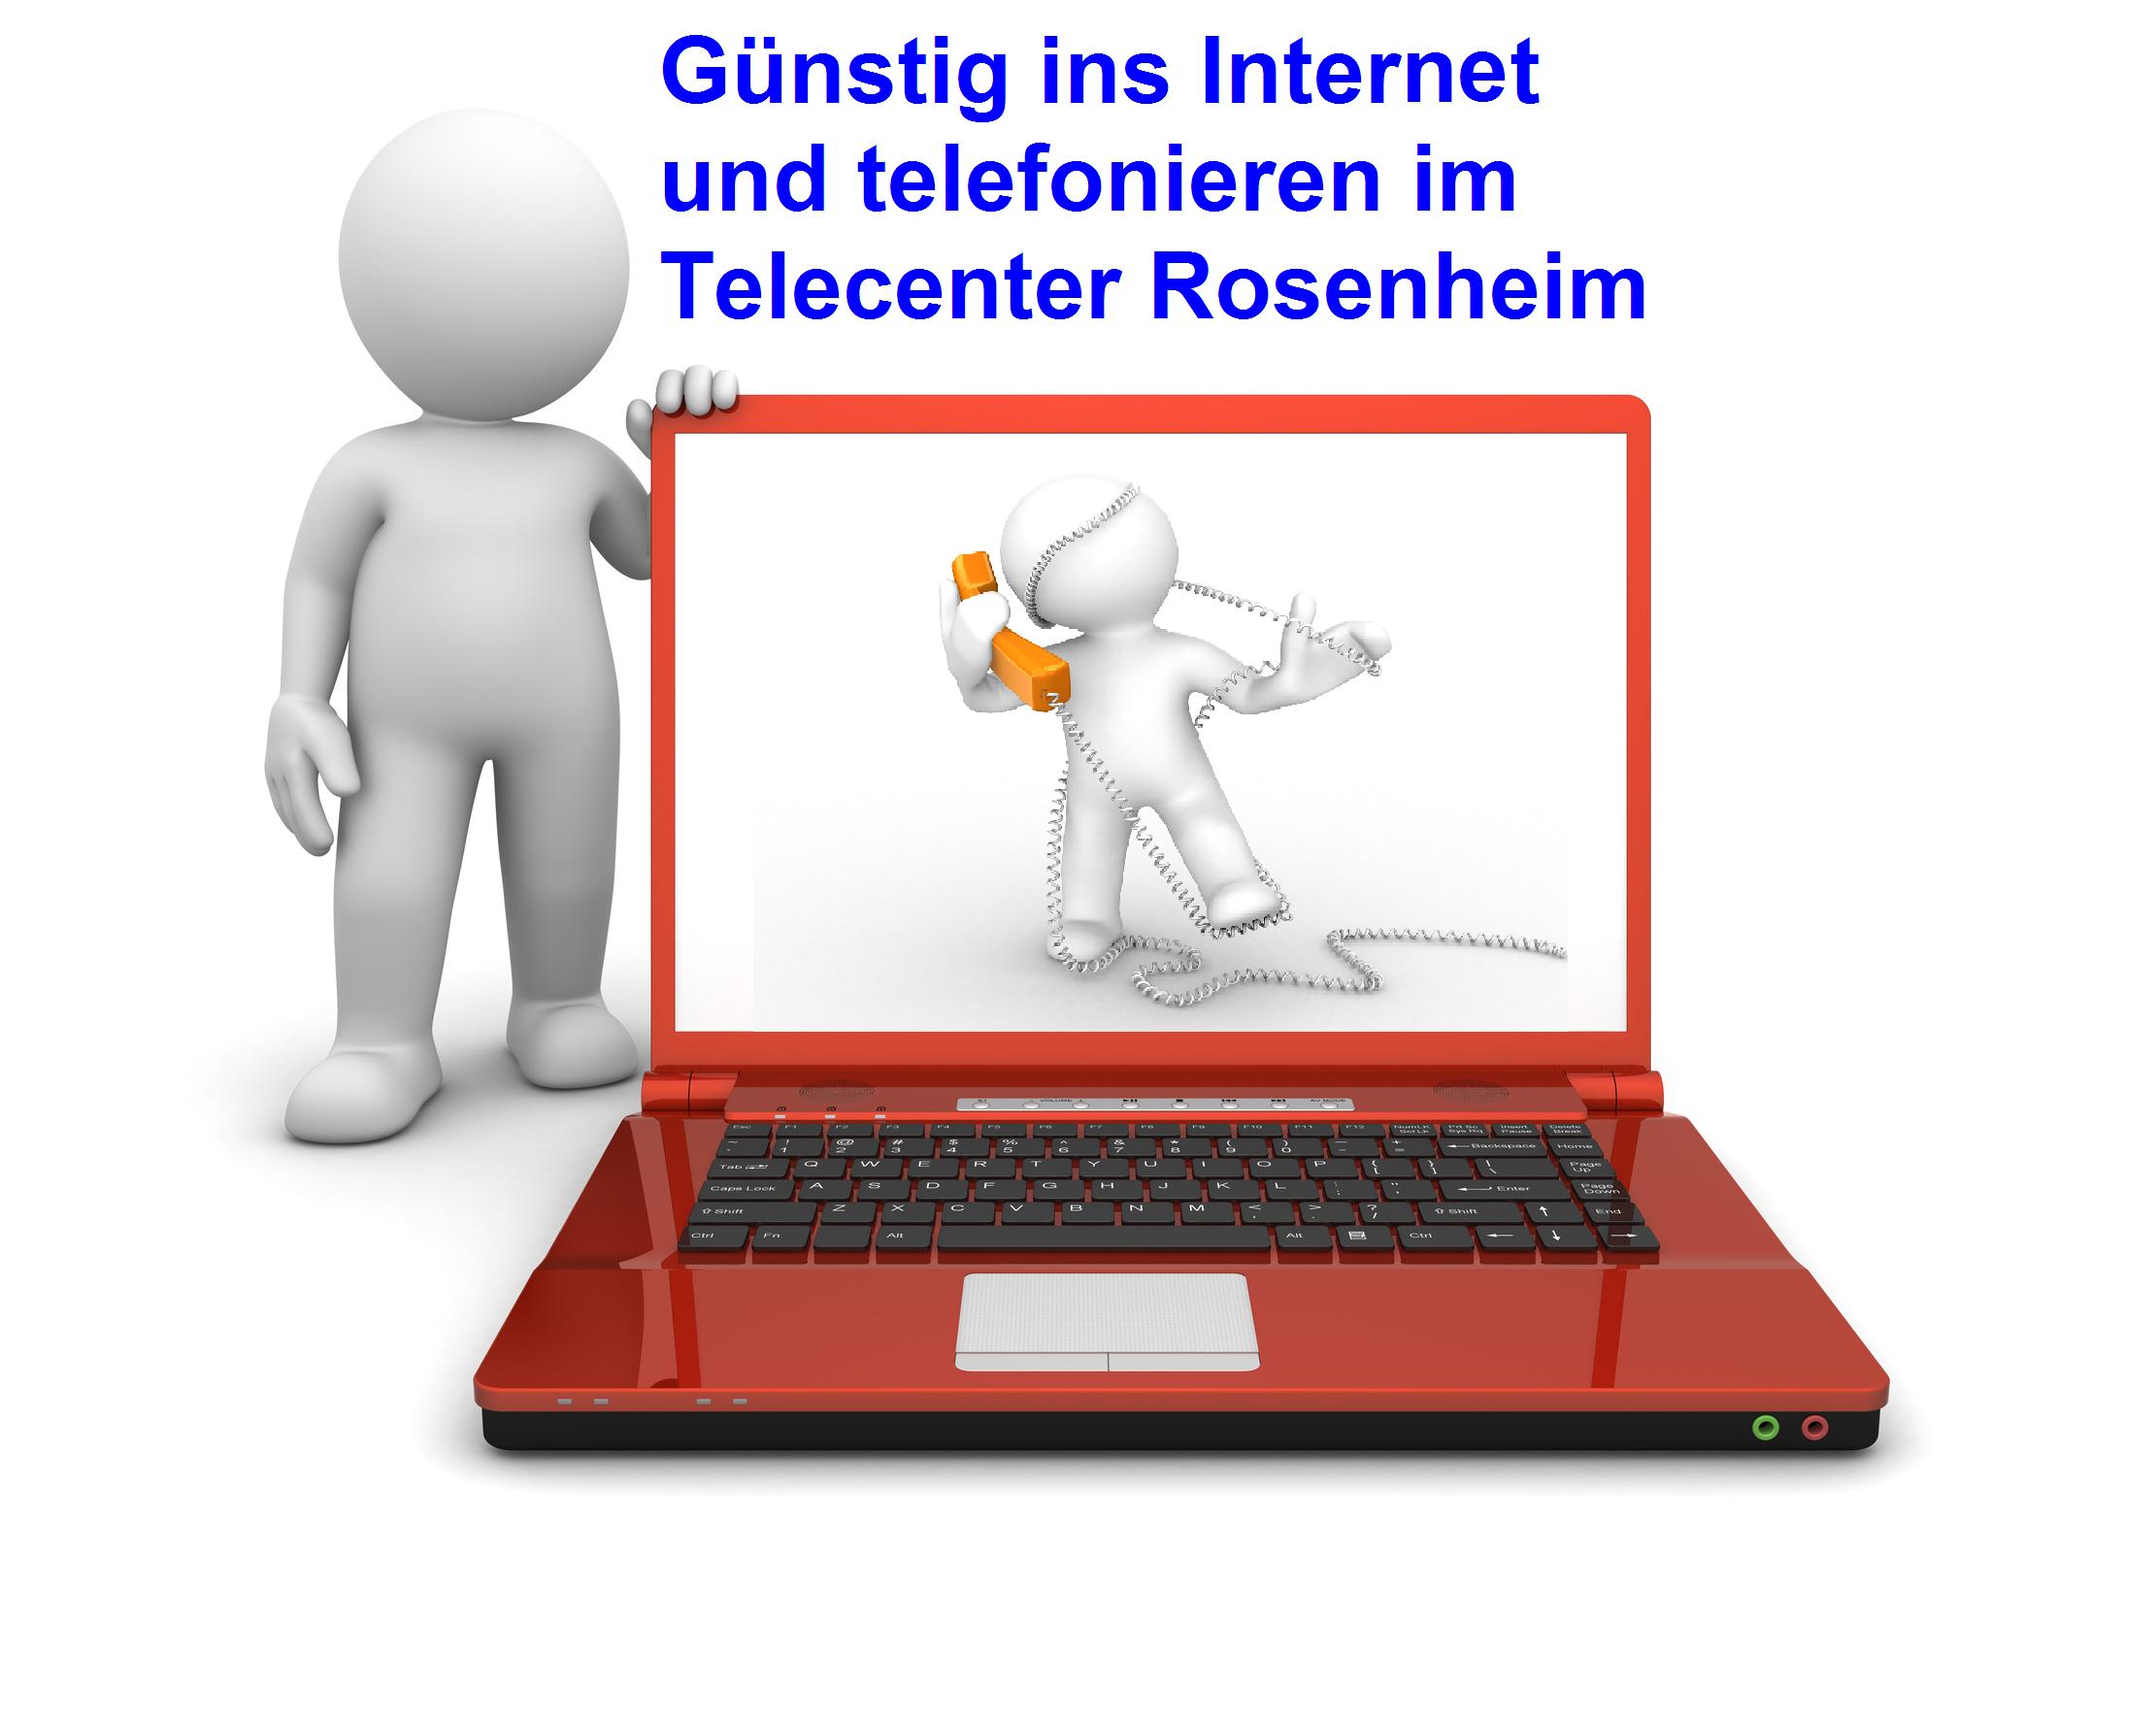 Telecenter Rosenheim